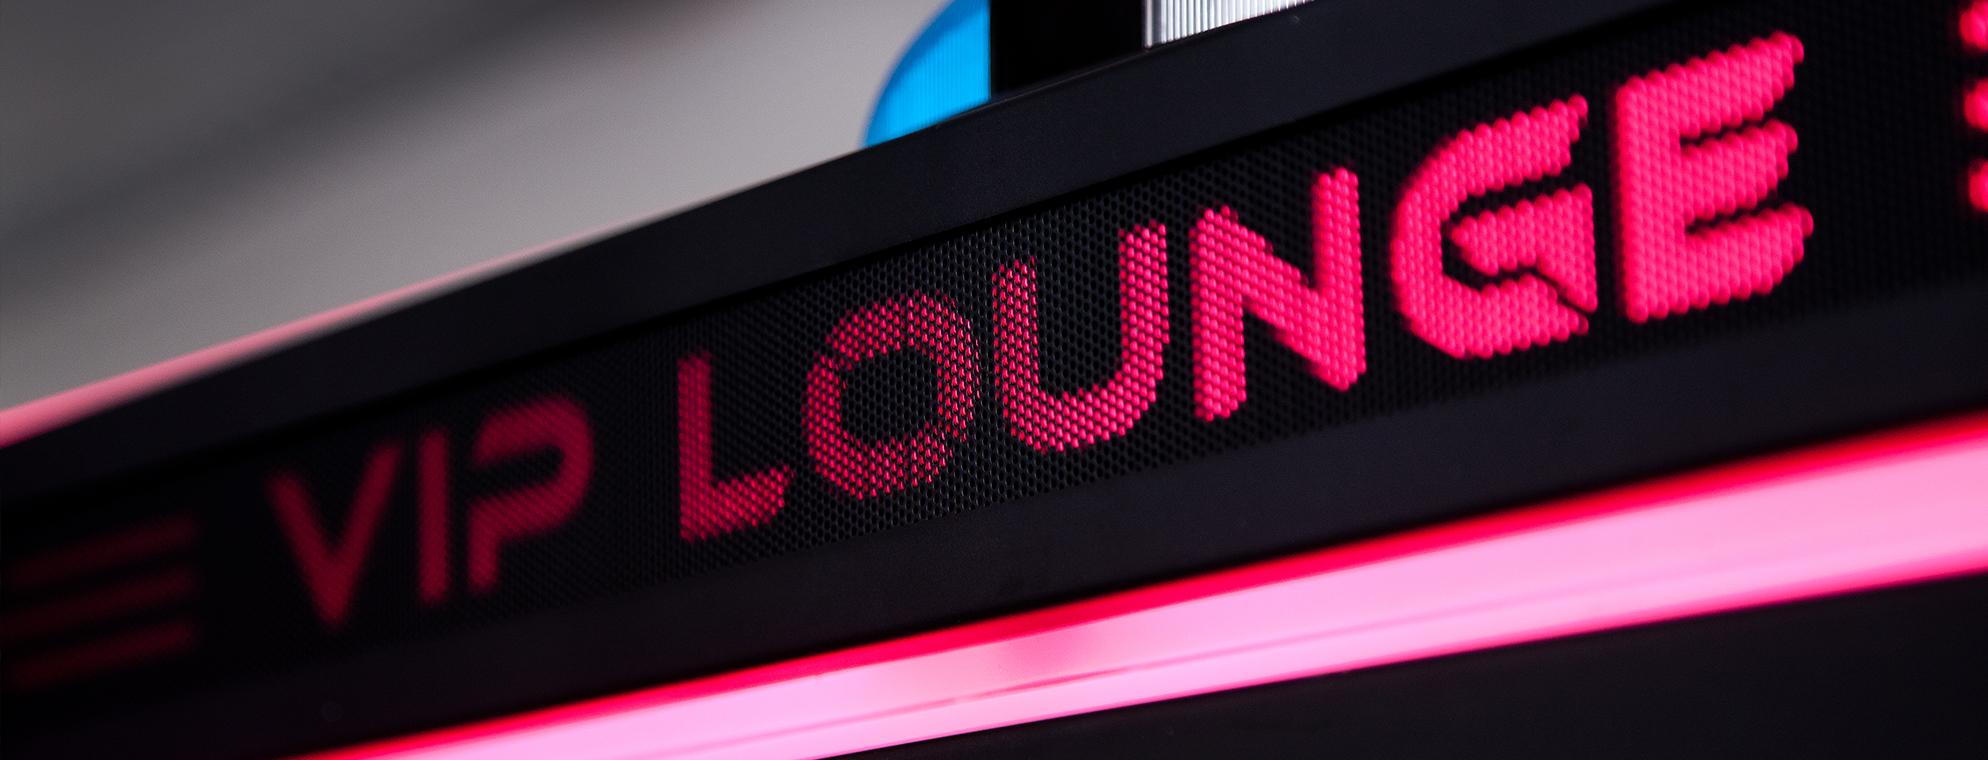 vip lounge weblside